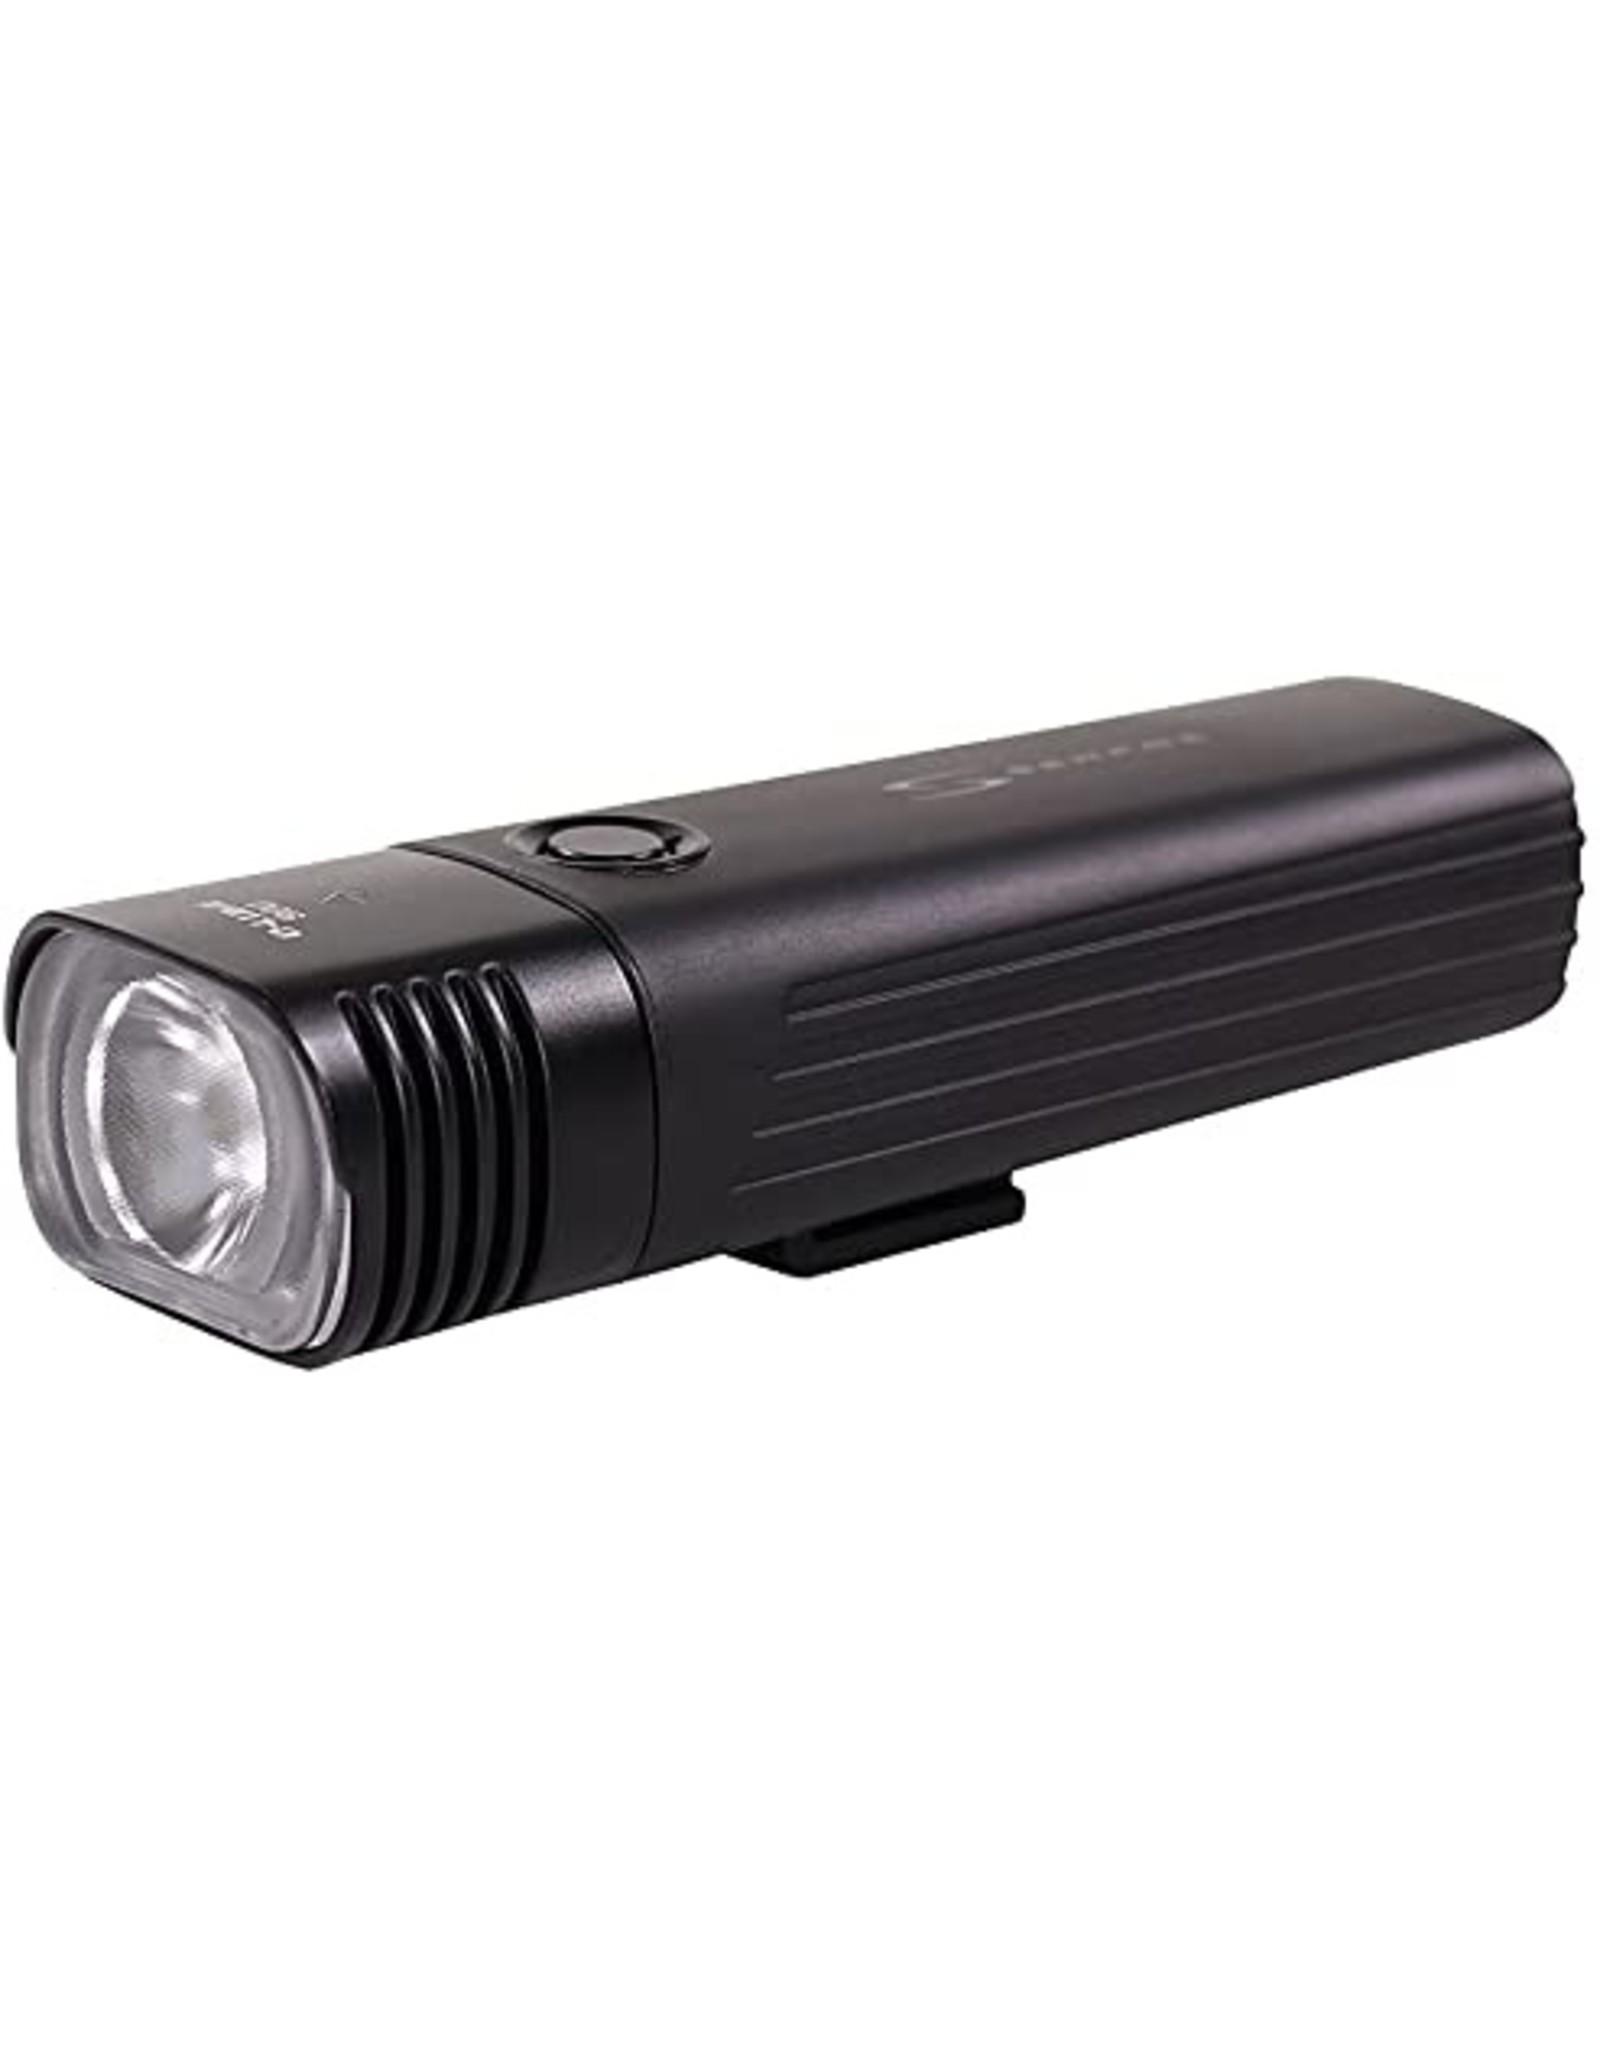 SERFAS SERFAS FR E-LUME 605 LIGHT